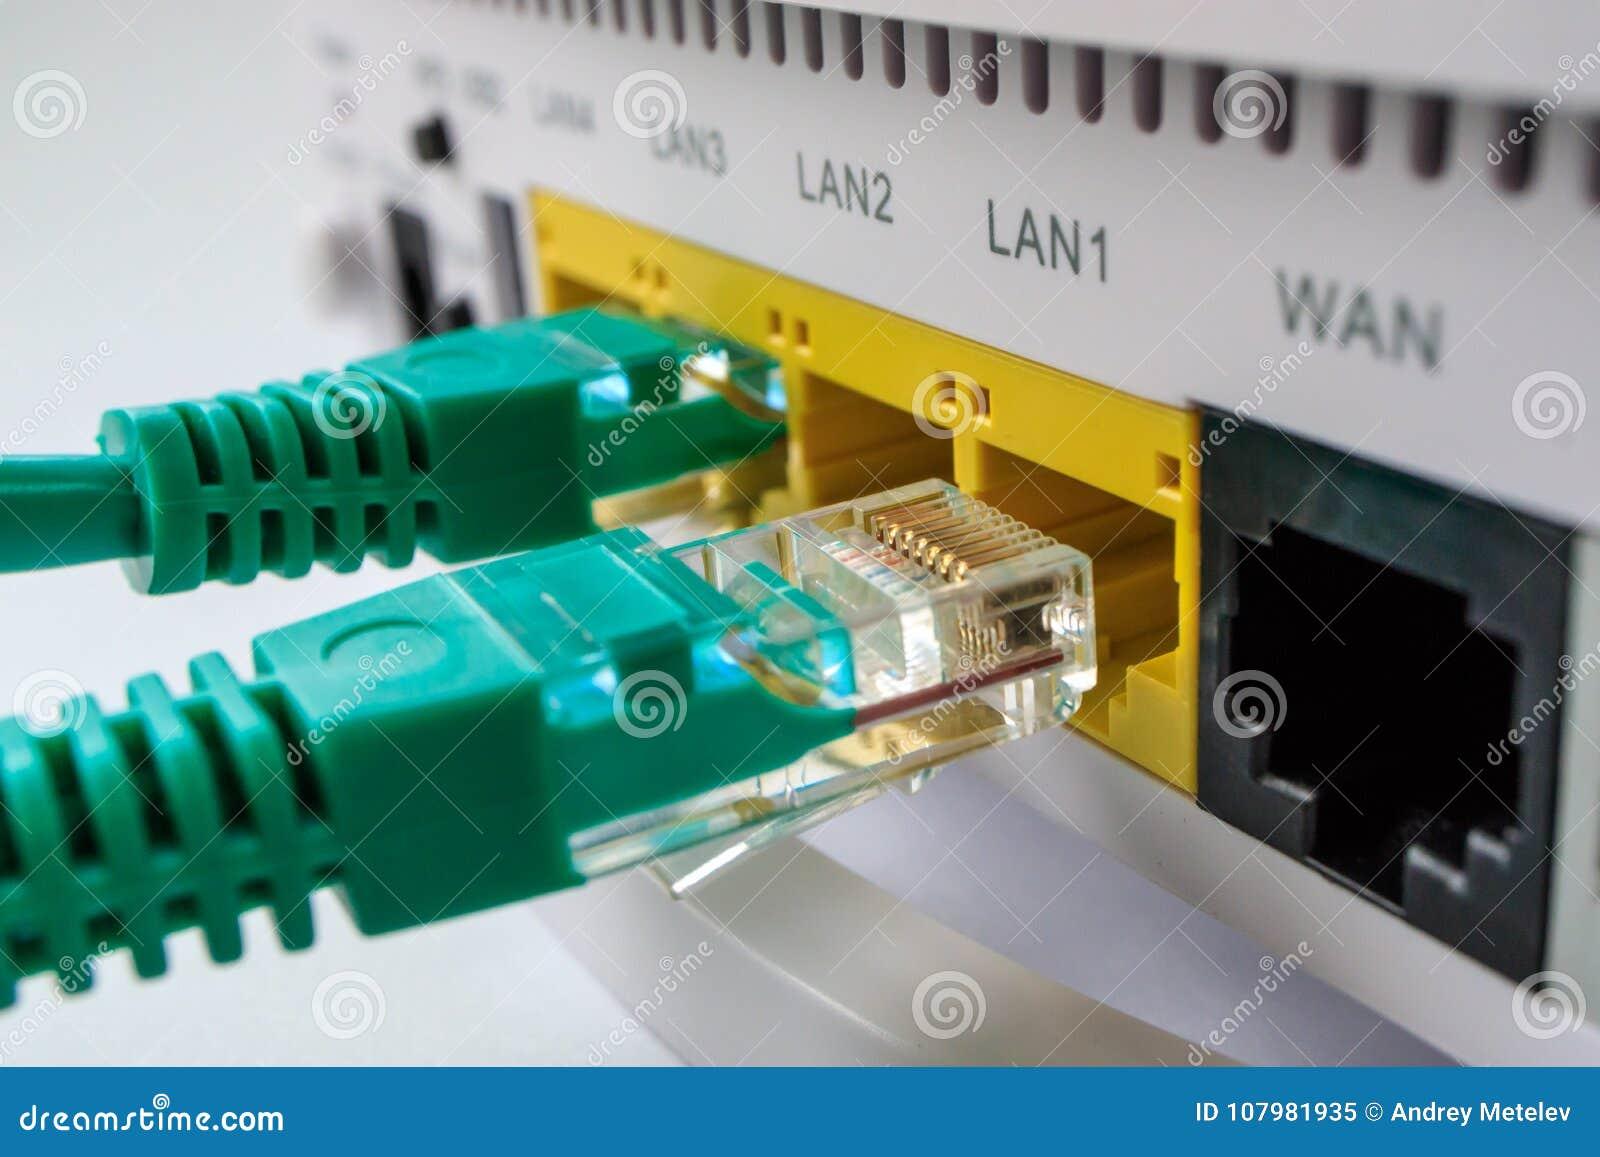 O roteador branco inclui dois conectores de cabo verdes rg45